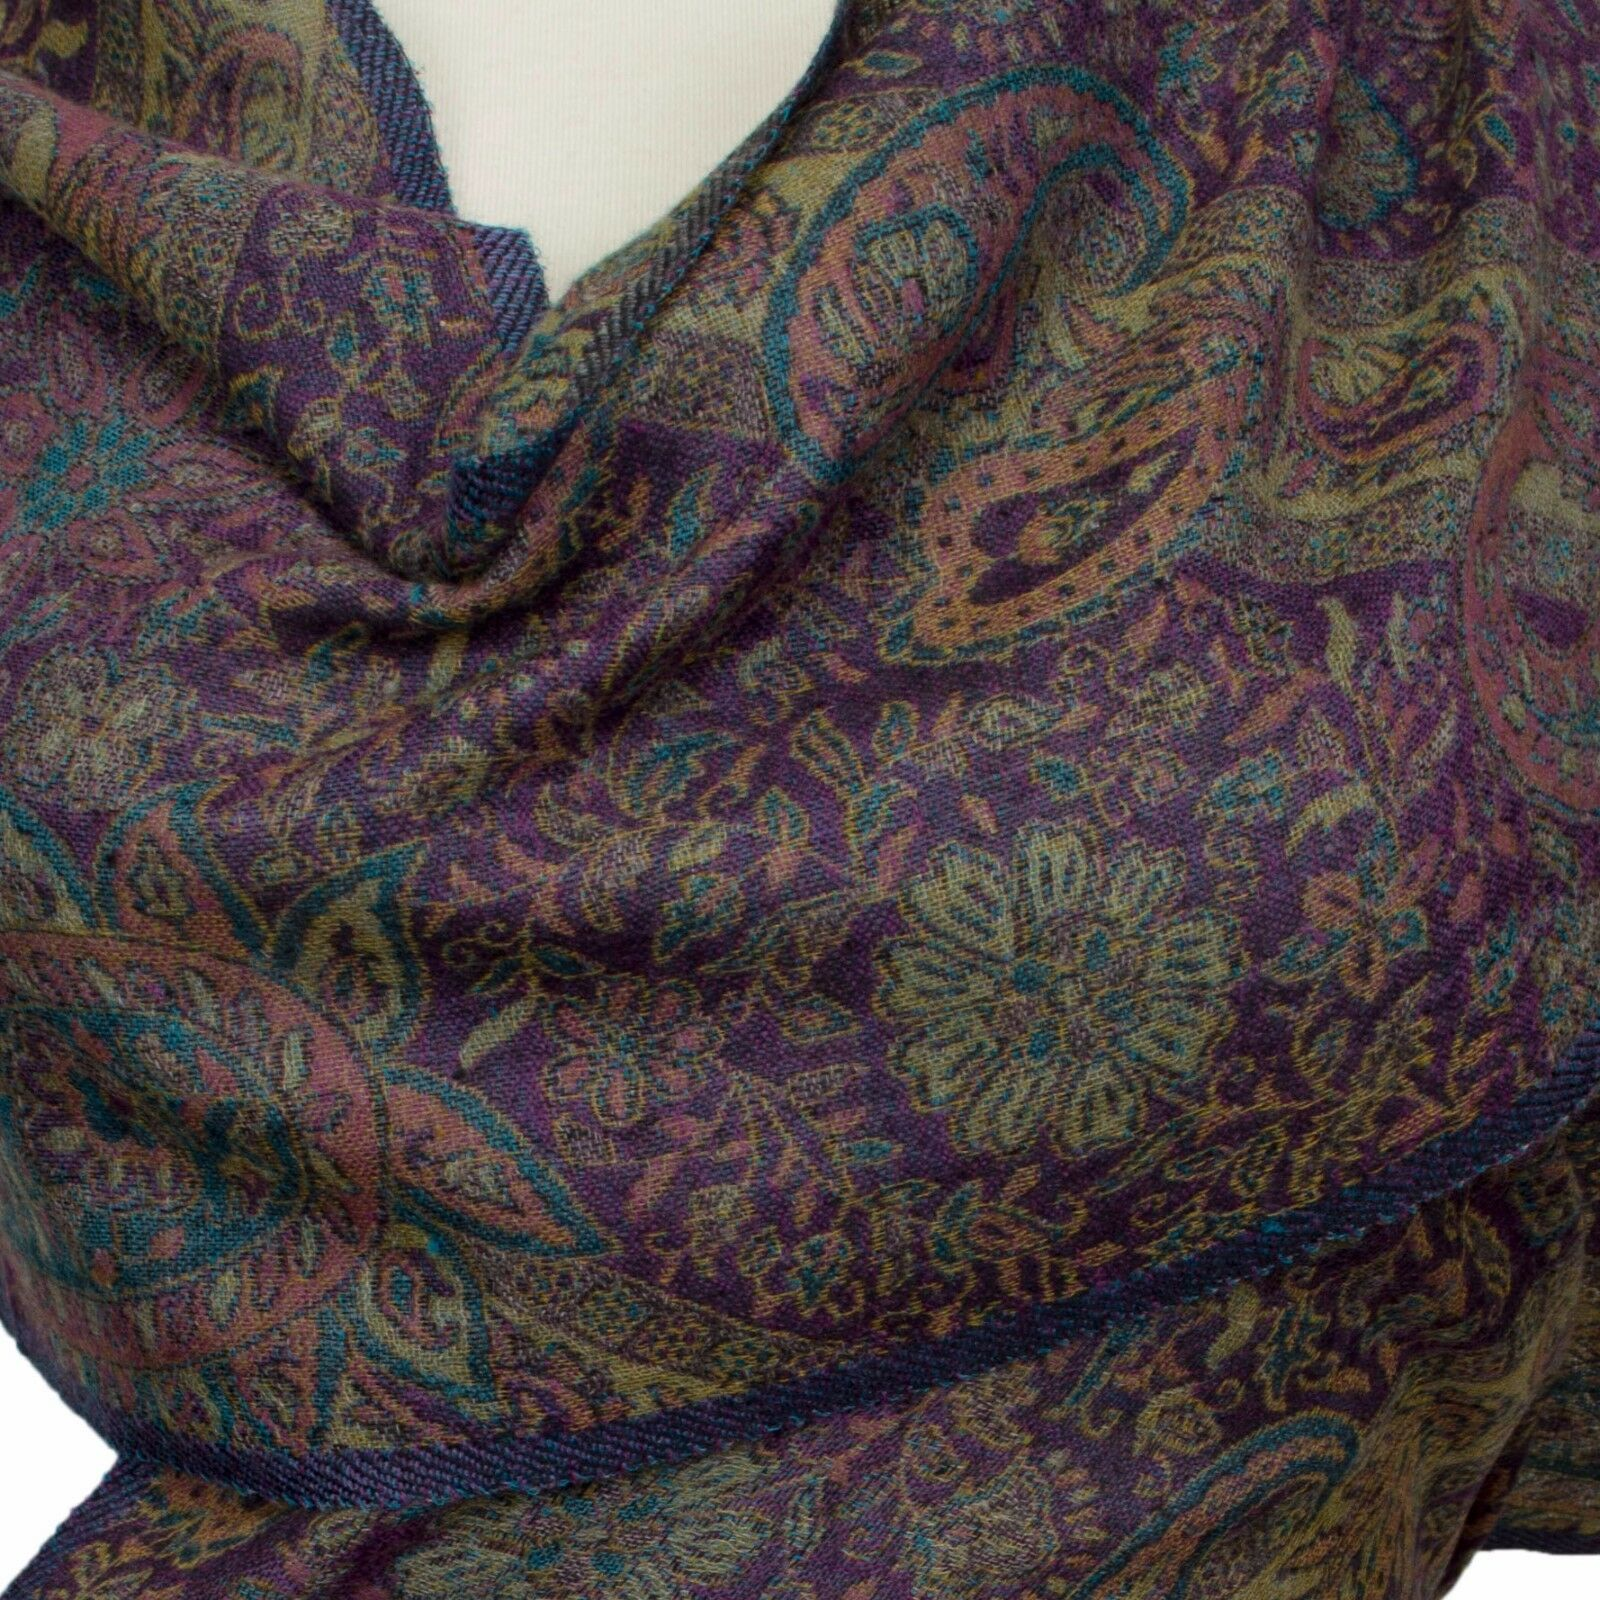 Pashmina  Schal 100% Kaschmir, Cashmere Cashmere Cashmere scarf  écharpe Foulard 34 x 167 Lila | Mittel Preis  | Attraktiv Und Langlebig  0f4fbb